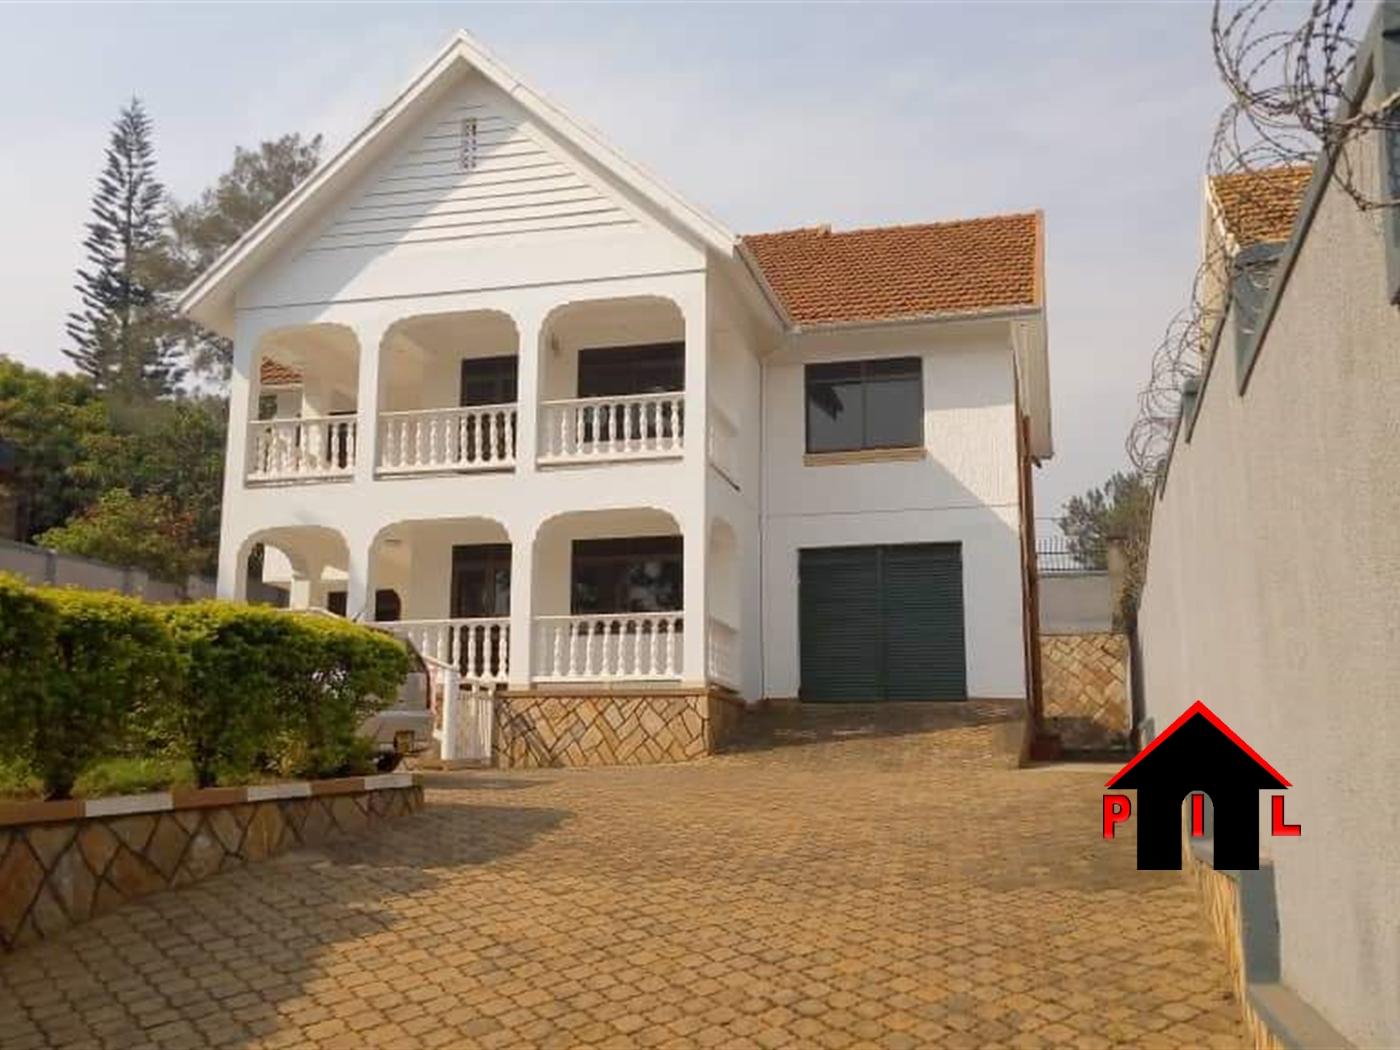 Storeyed house for sale in Naguru Kampala